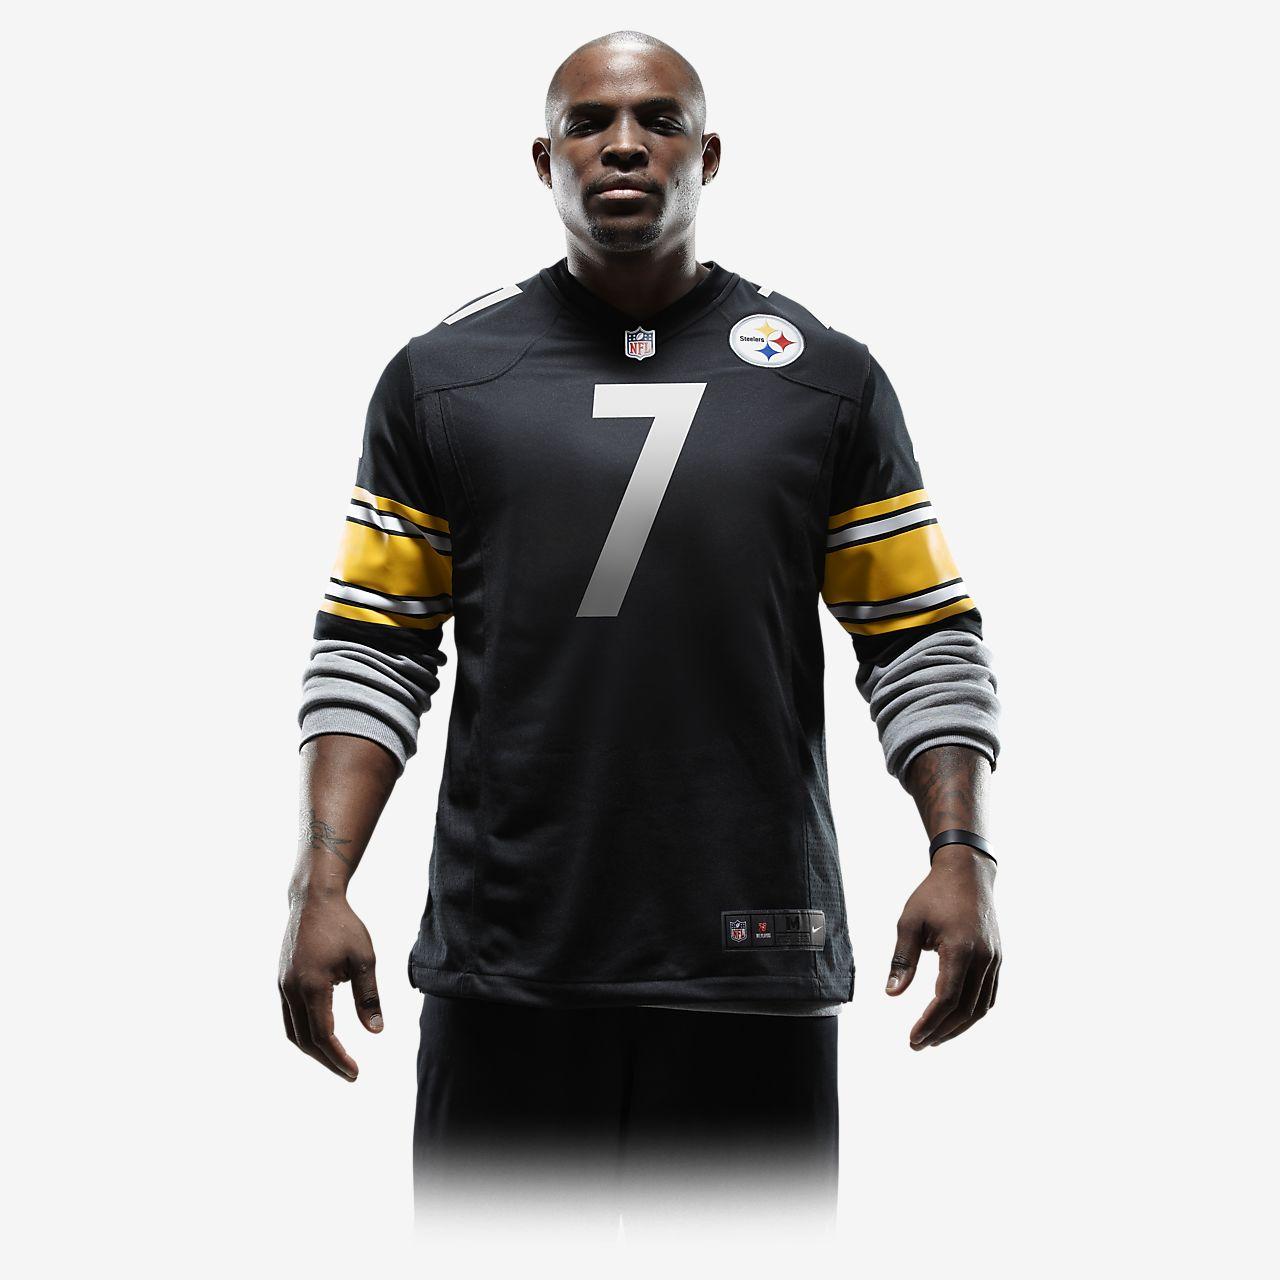 big sale 49704 c8c1d NFL Pittsburgh Steelers (Ben Roethlisberger) Men's Football Home Game Jersey